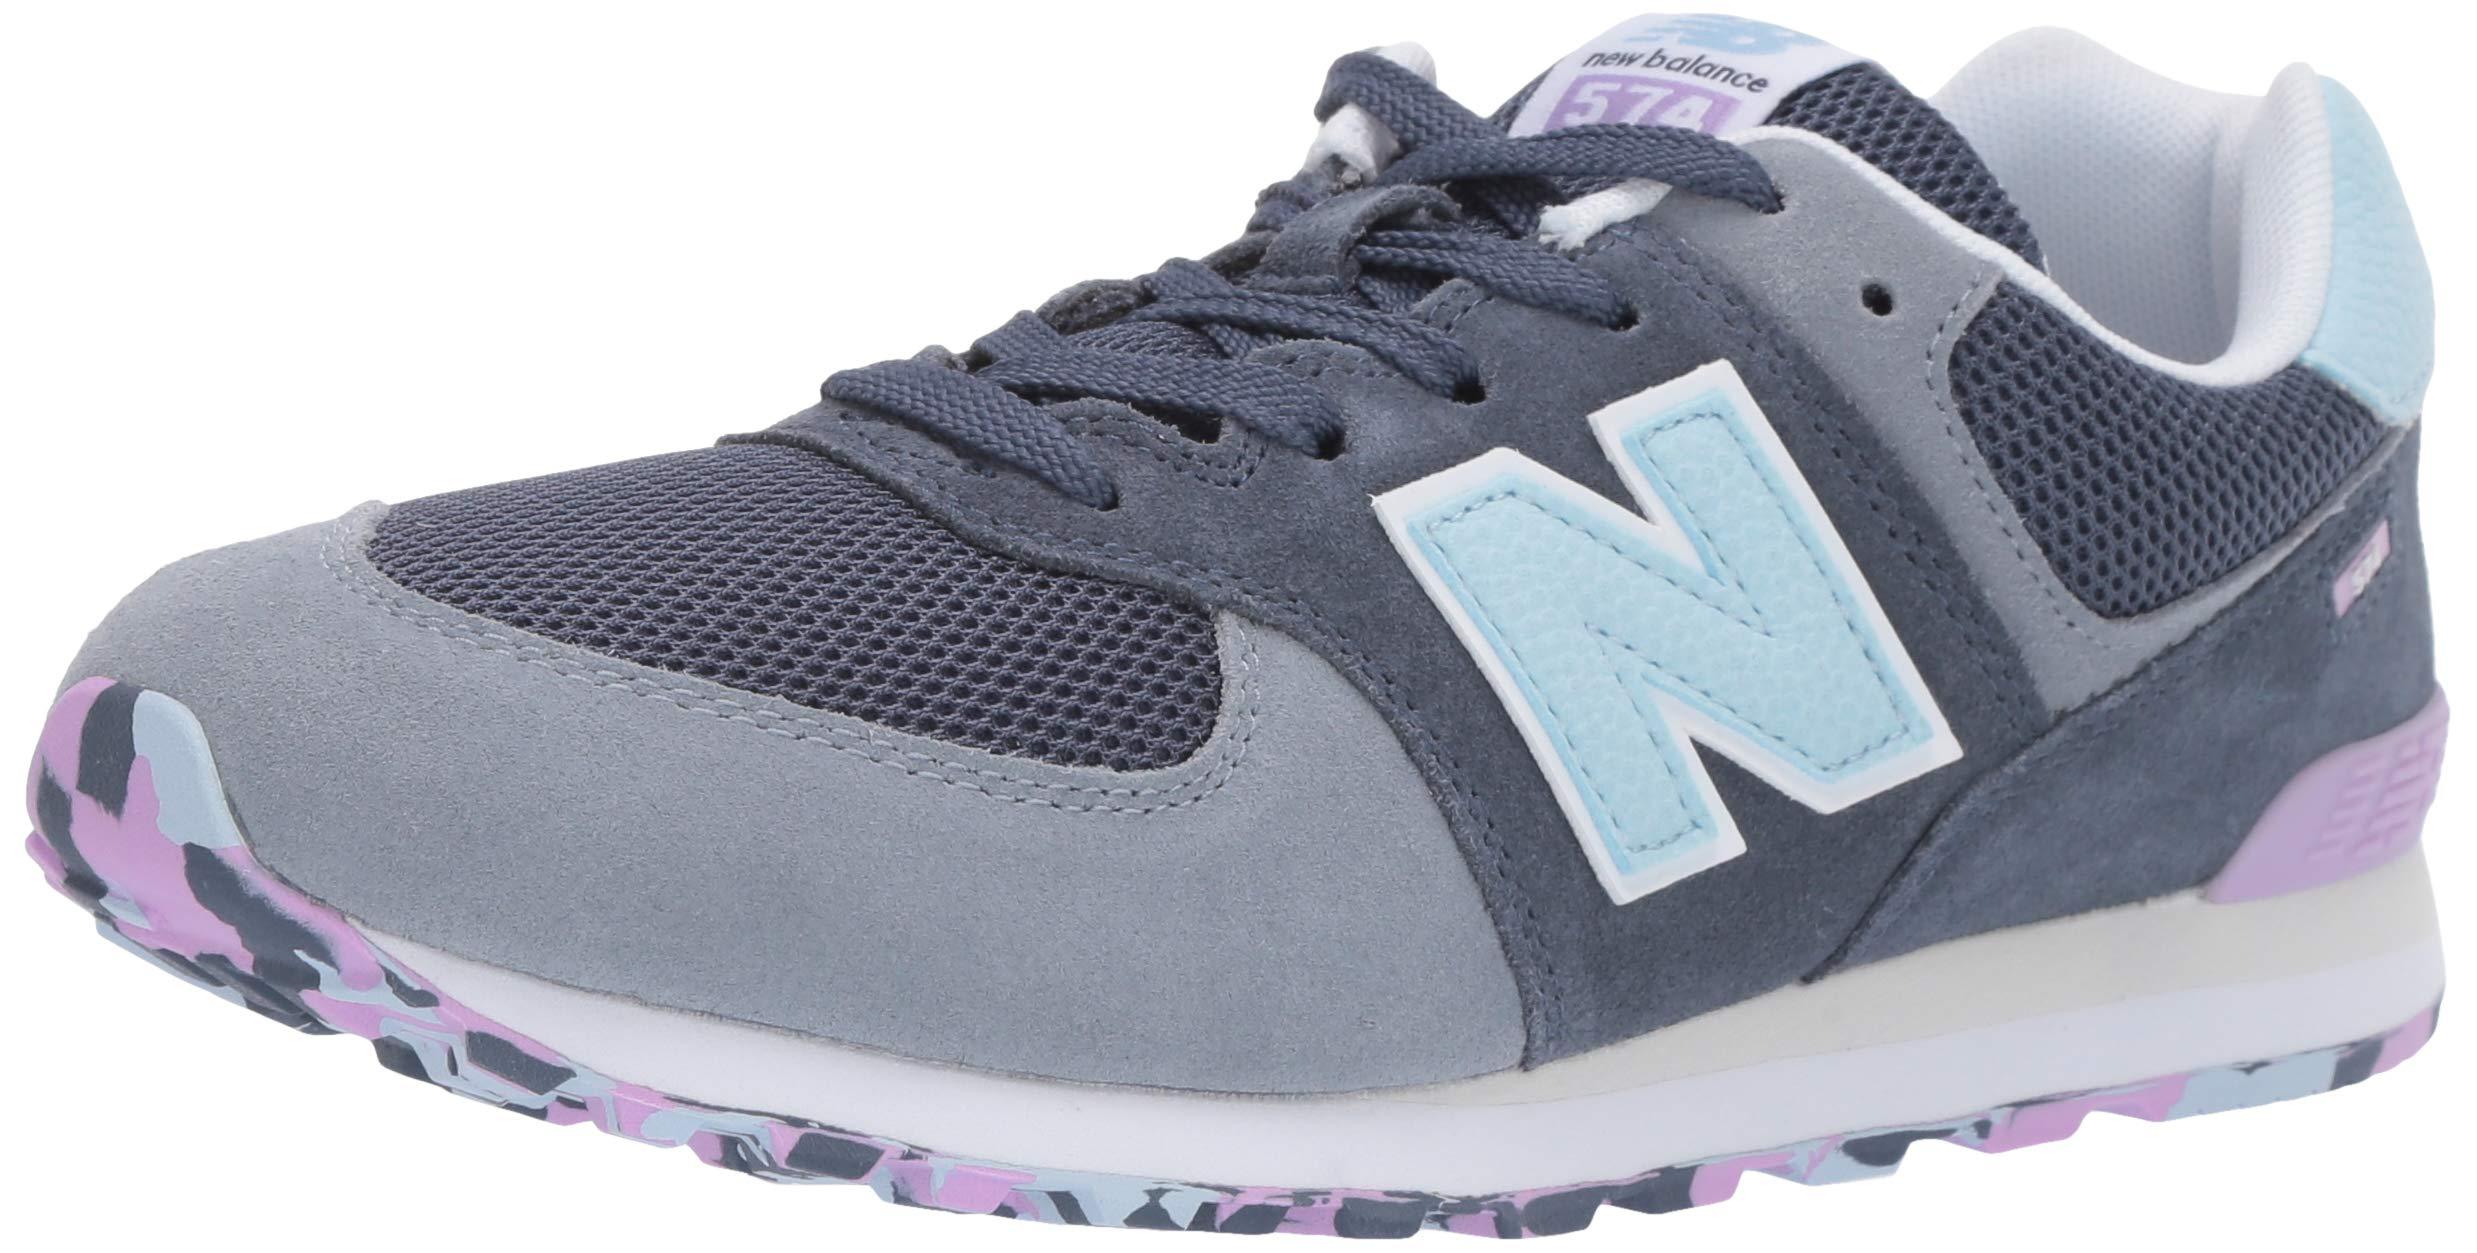 New Balance Boys' Iconic 574 Sneaker Vintage Indigo/Dark Violet glo 1 M US Little Kid